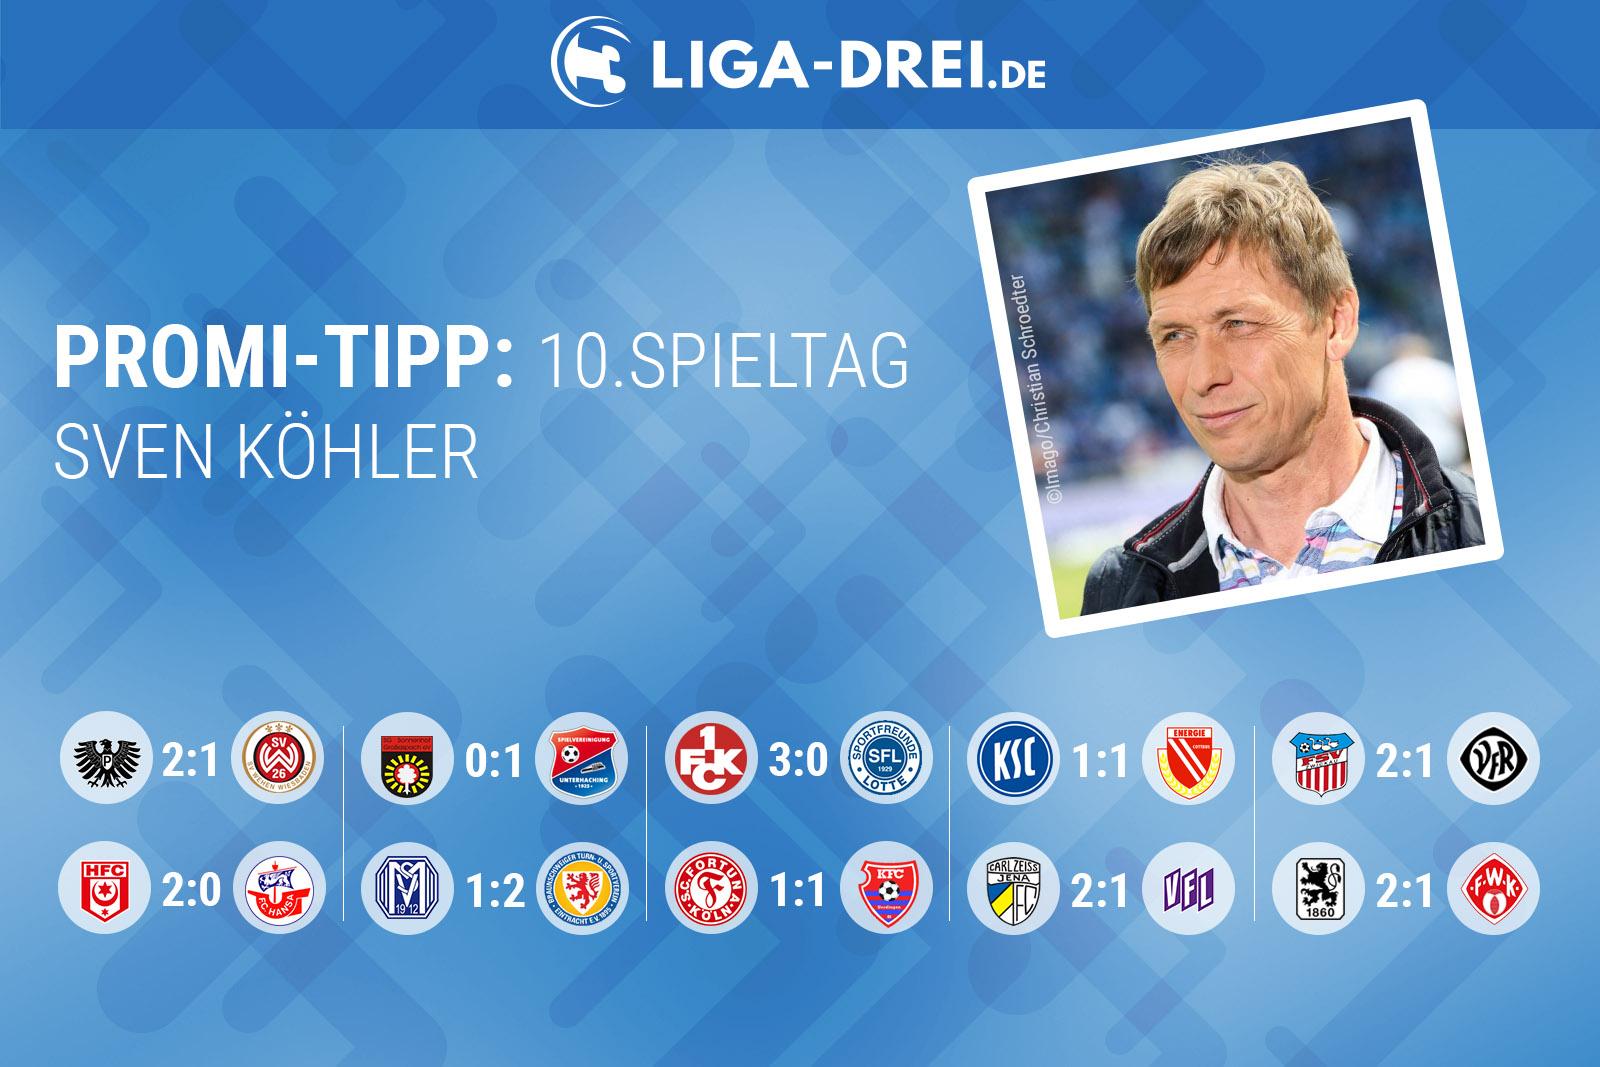 Sven Köhler beim Liga-Drei.de Promi-Tipp